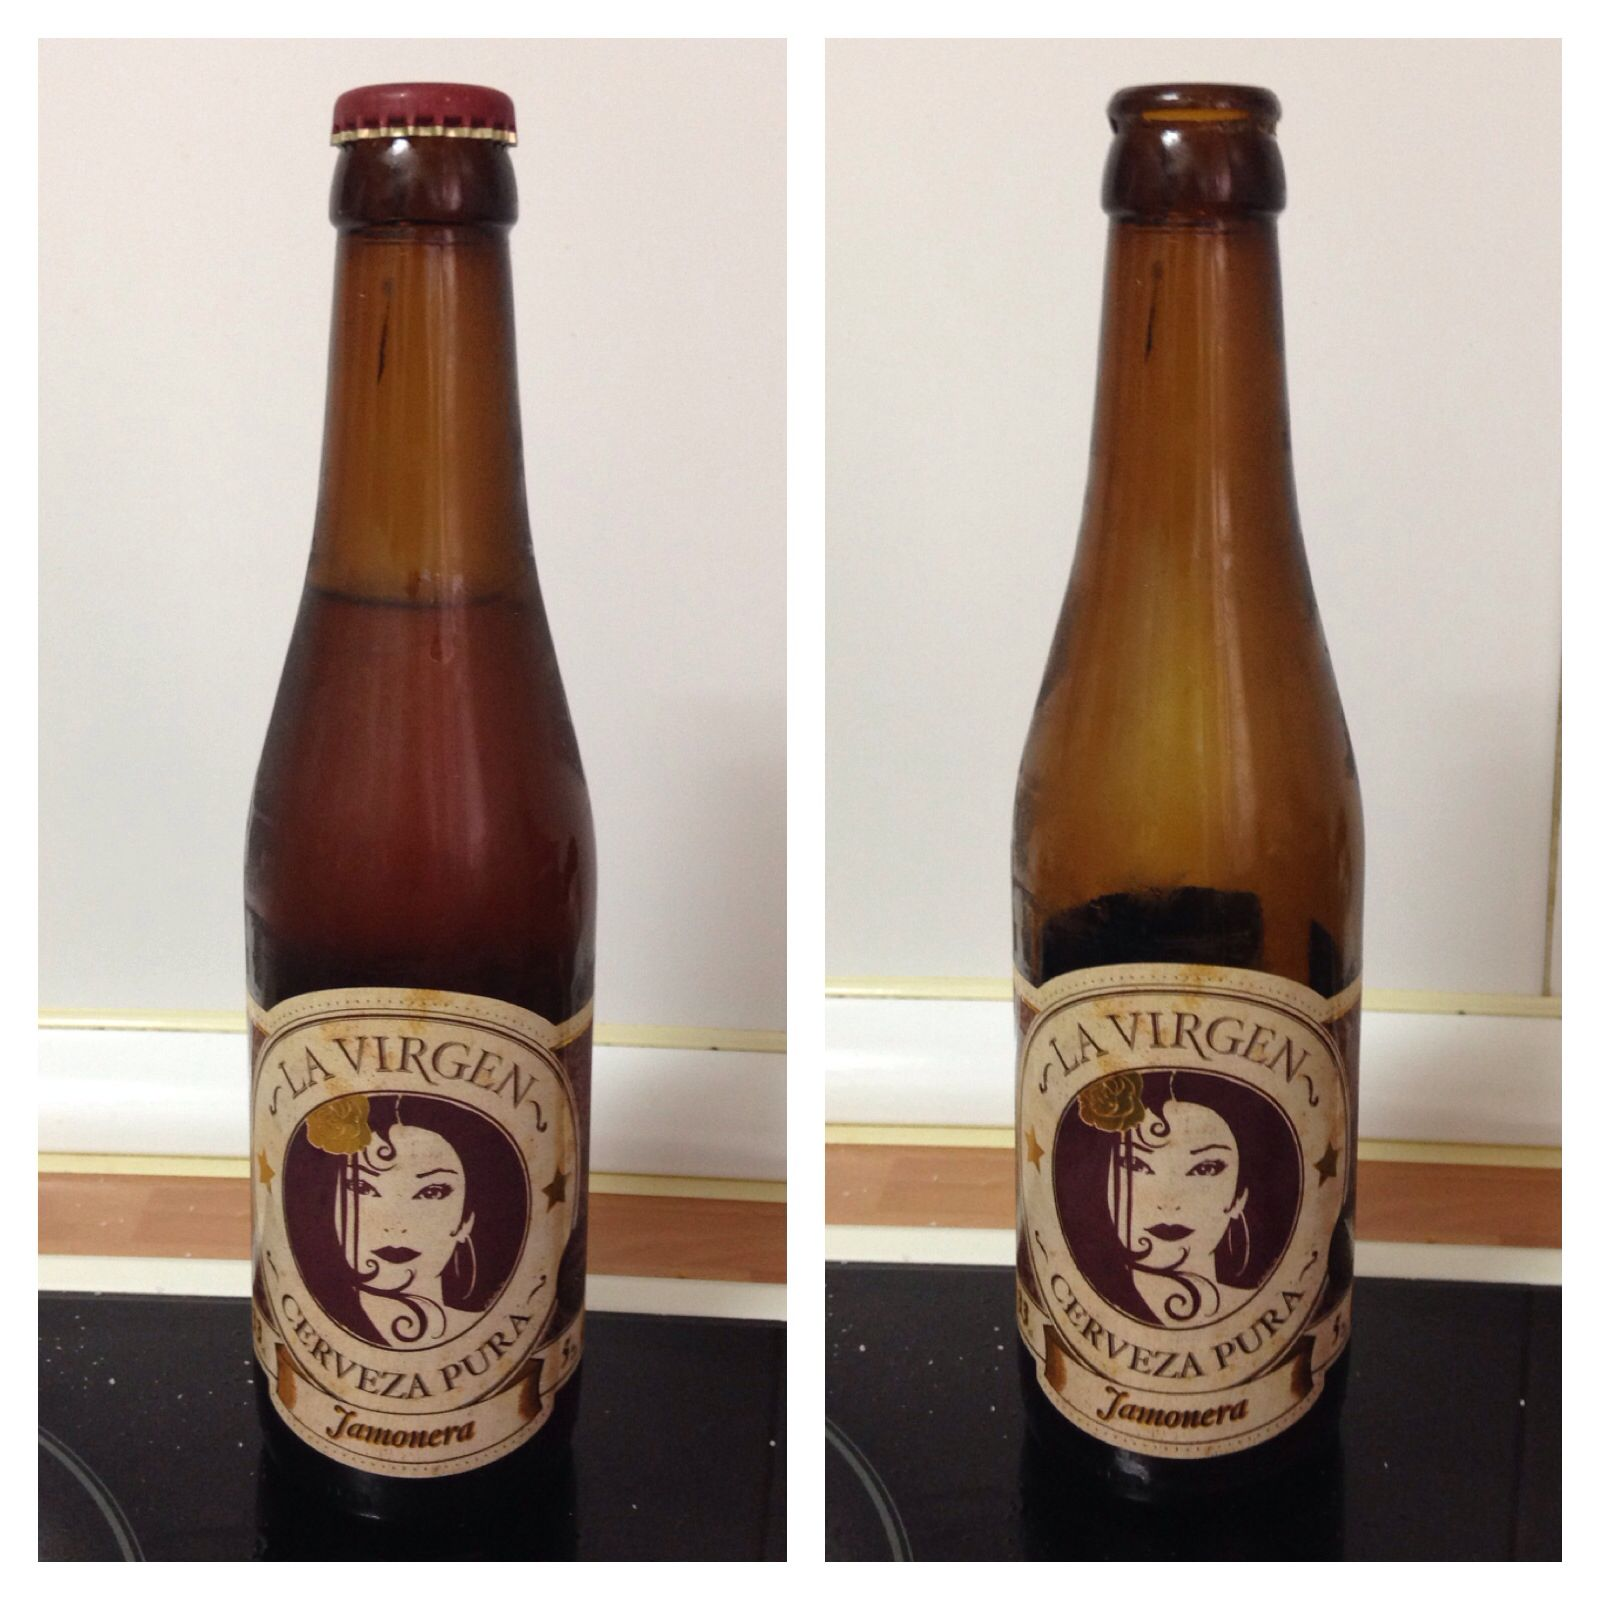 La Virgen Cerveza Pura Rubia 5 Alcohol Curiosa Cerveza Con Un